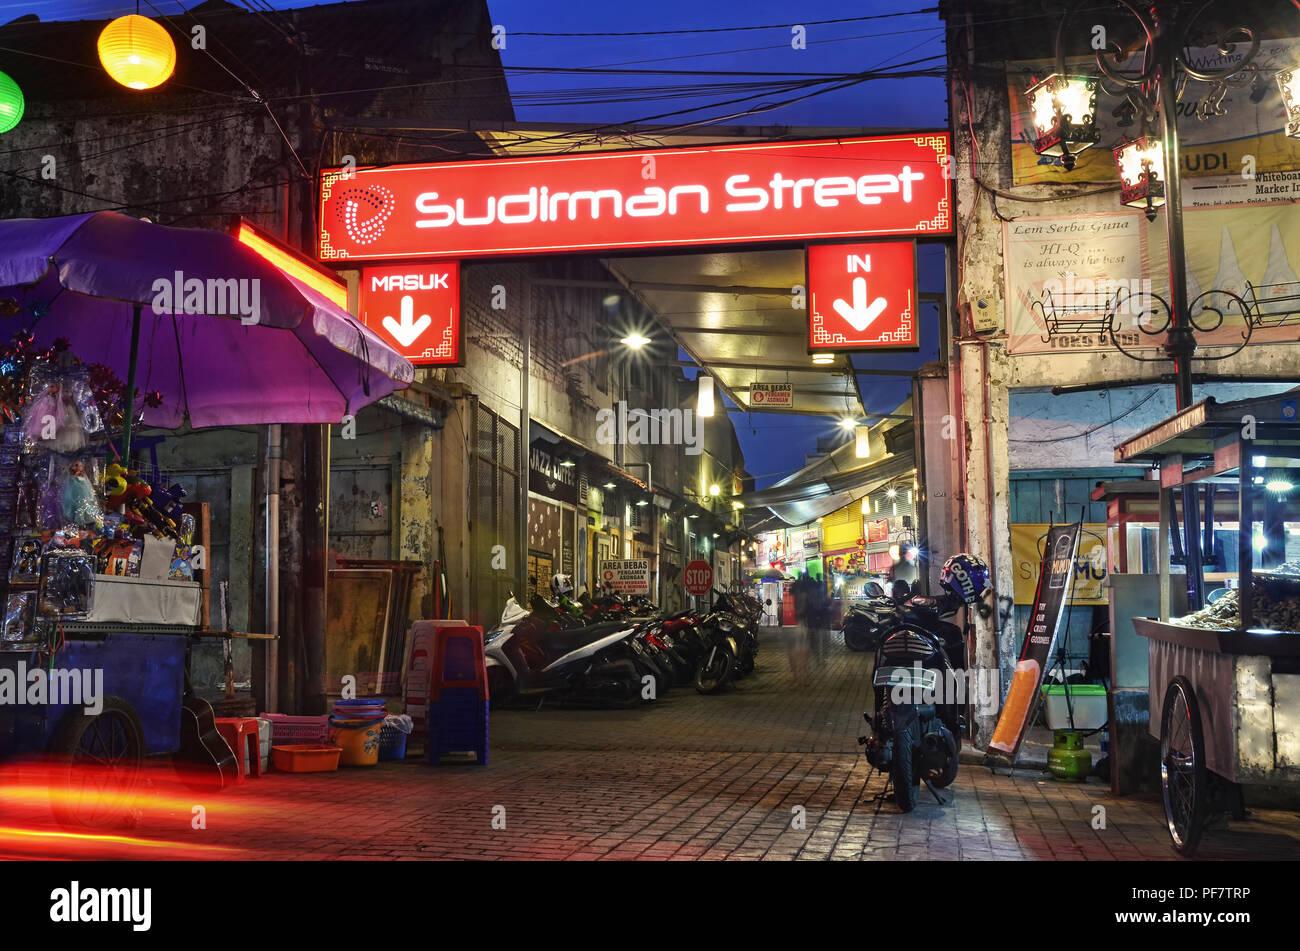 Sudirman Street, a culinary street/area in Bandung Stock Photo